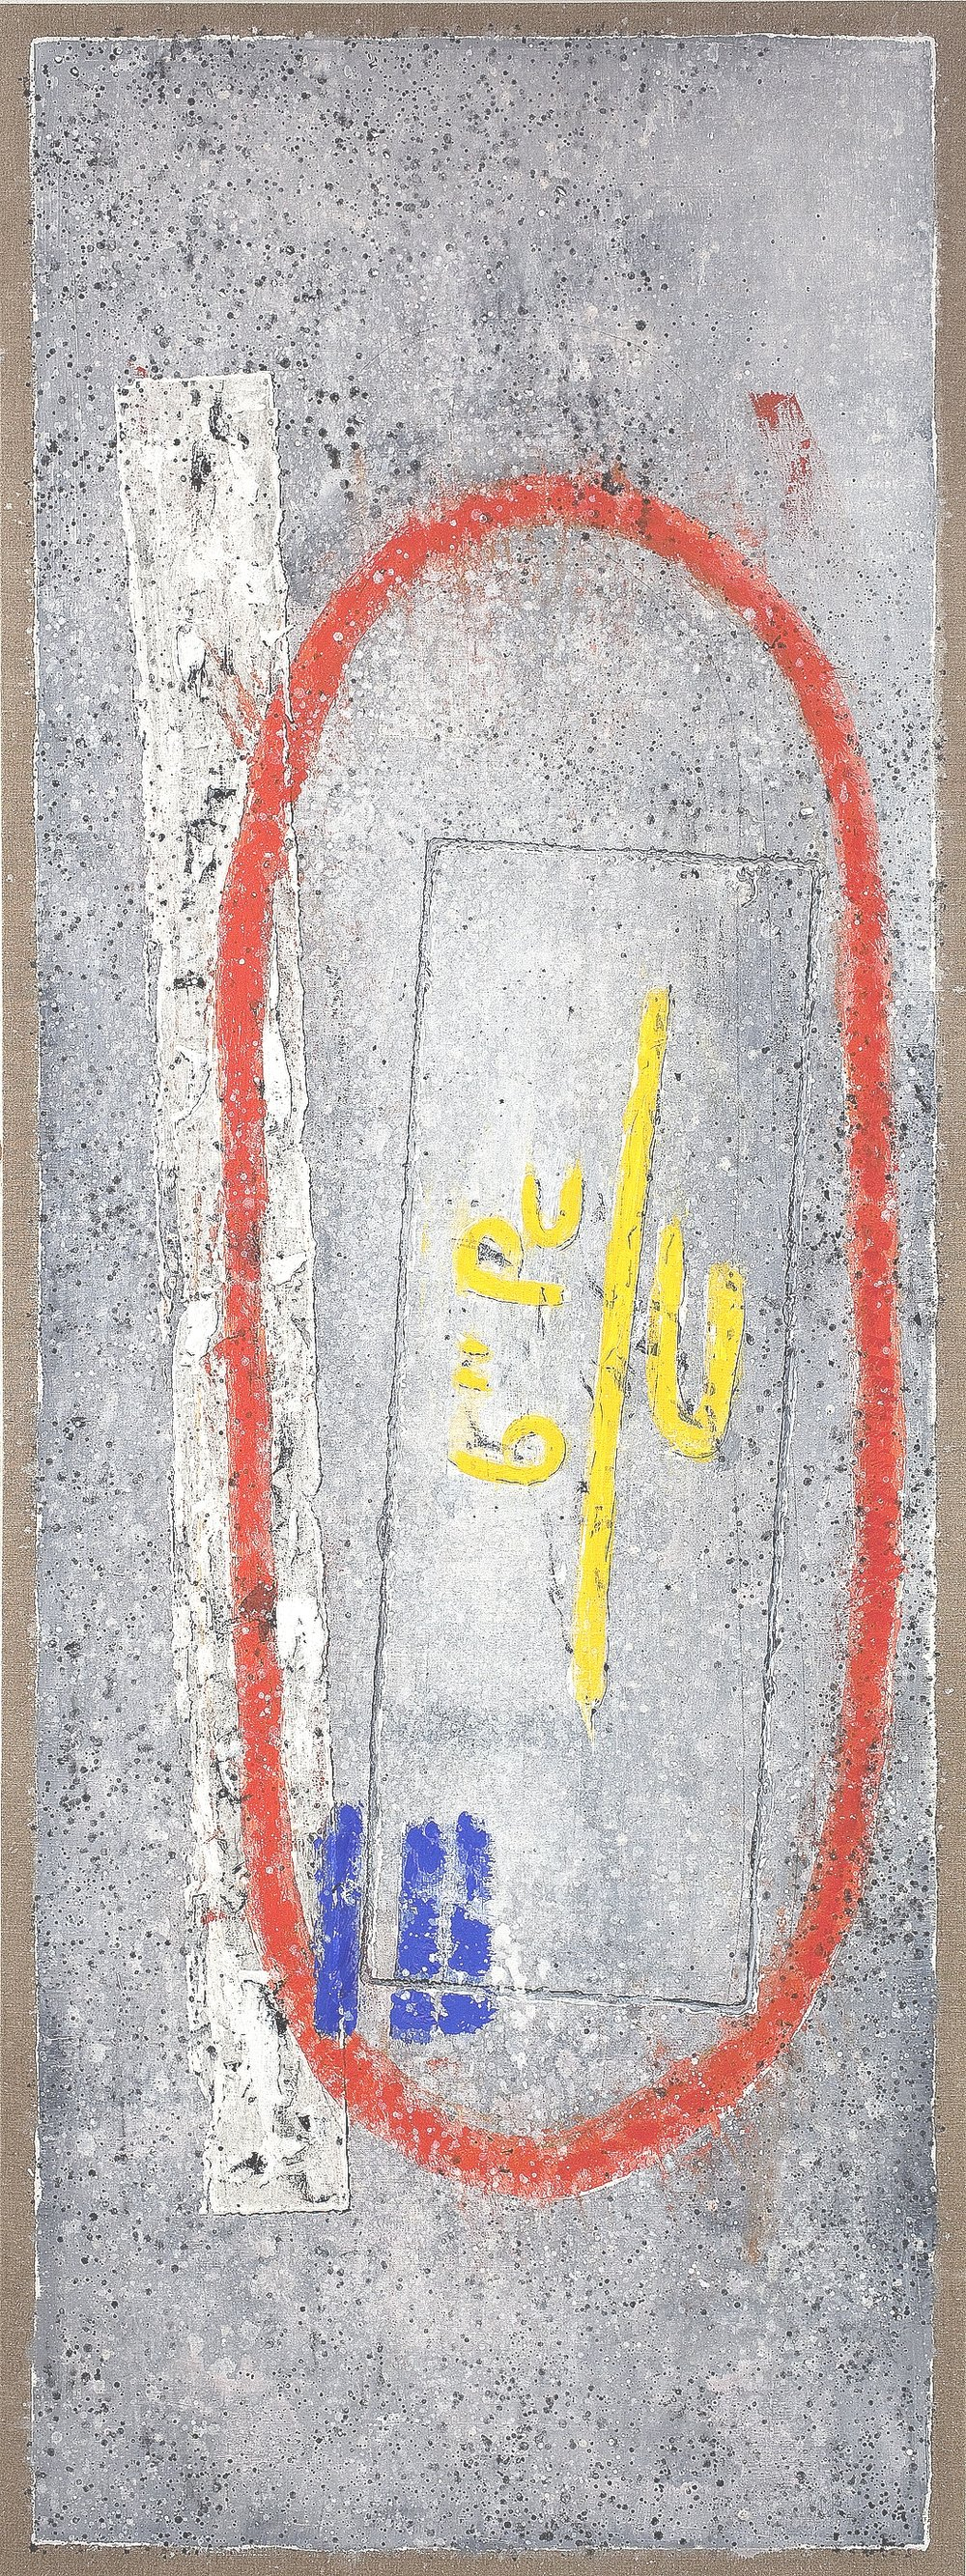 Ganesha, 80 x 30 inches, 2011